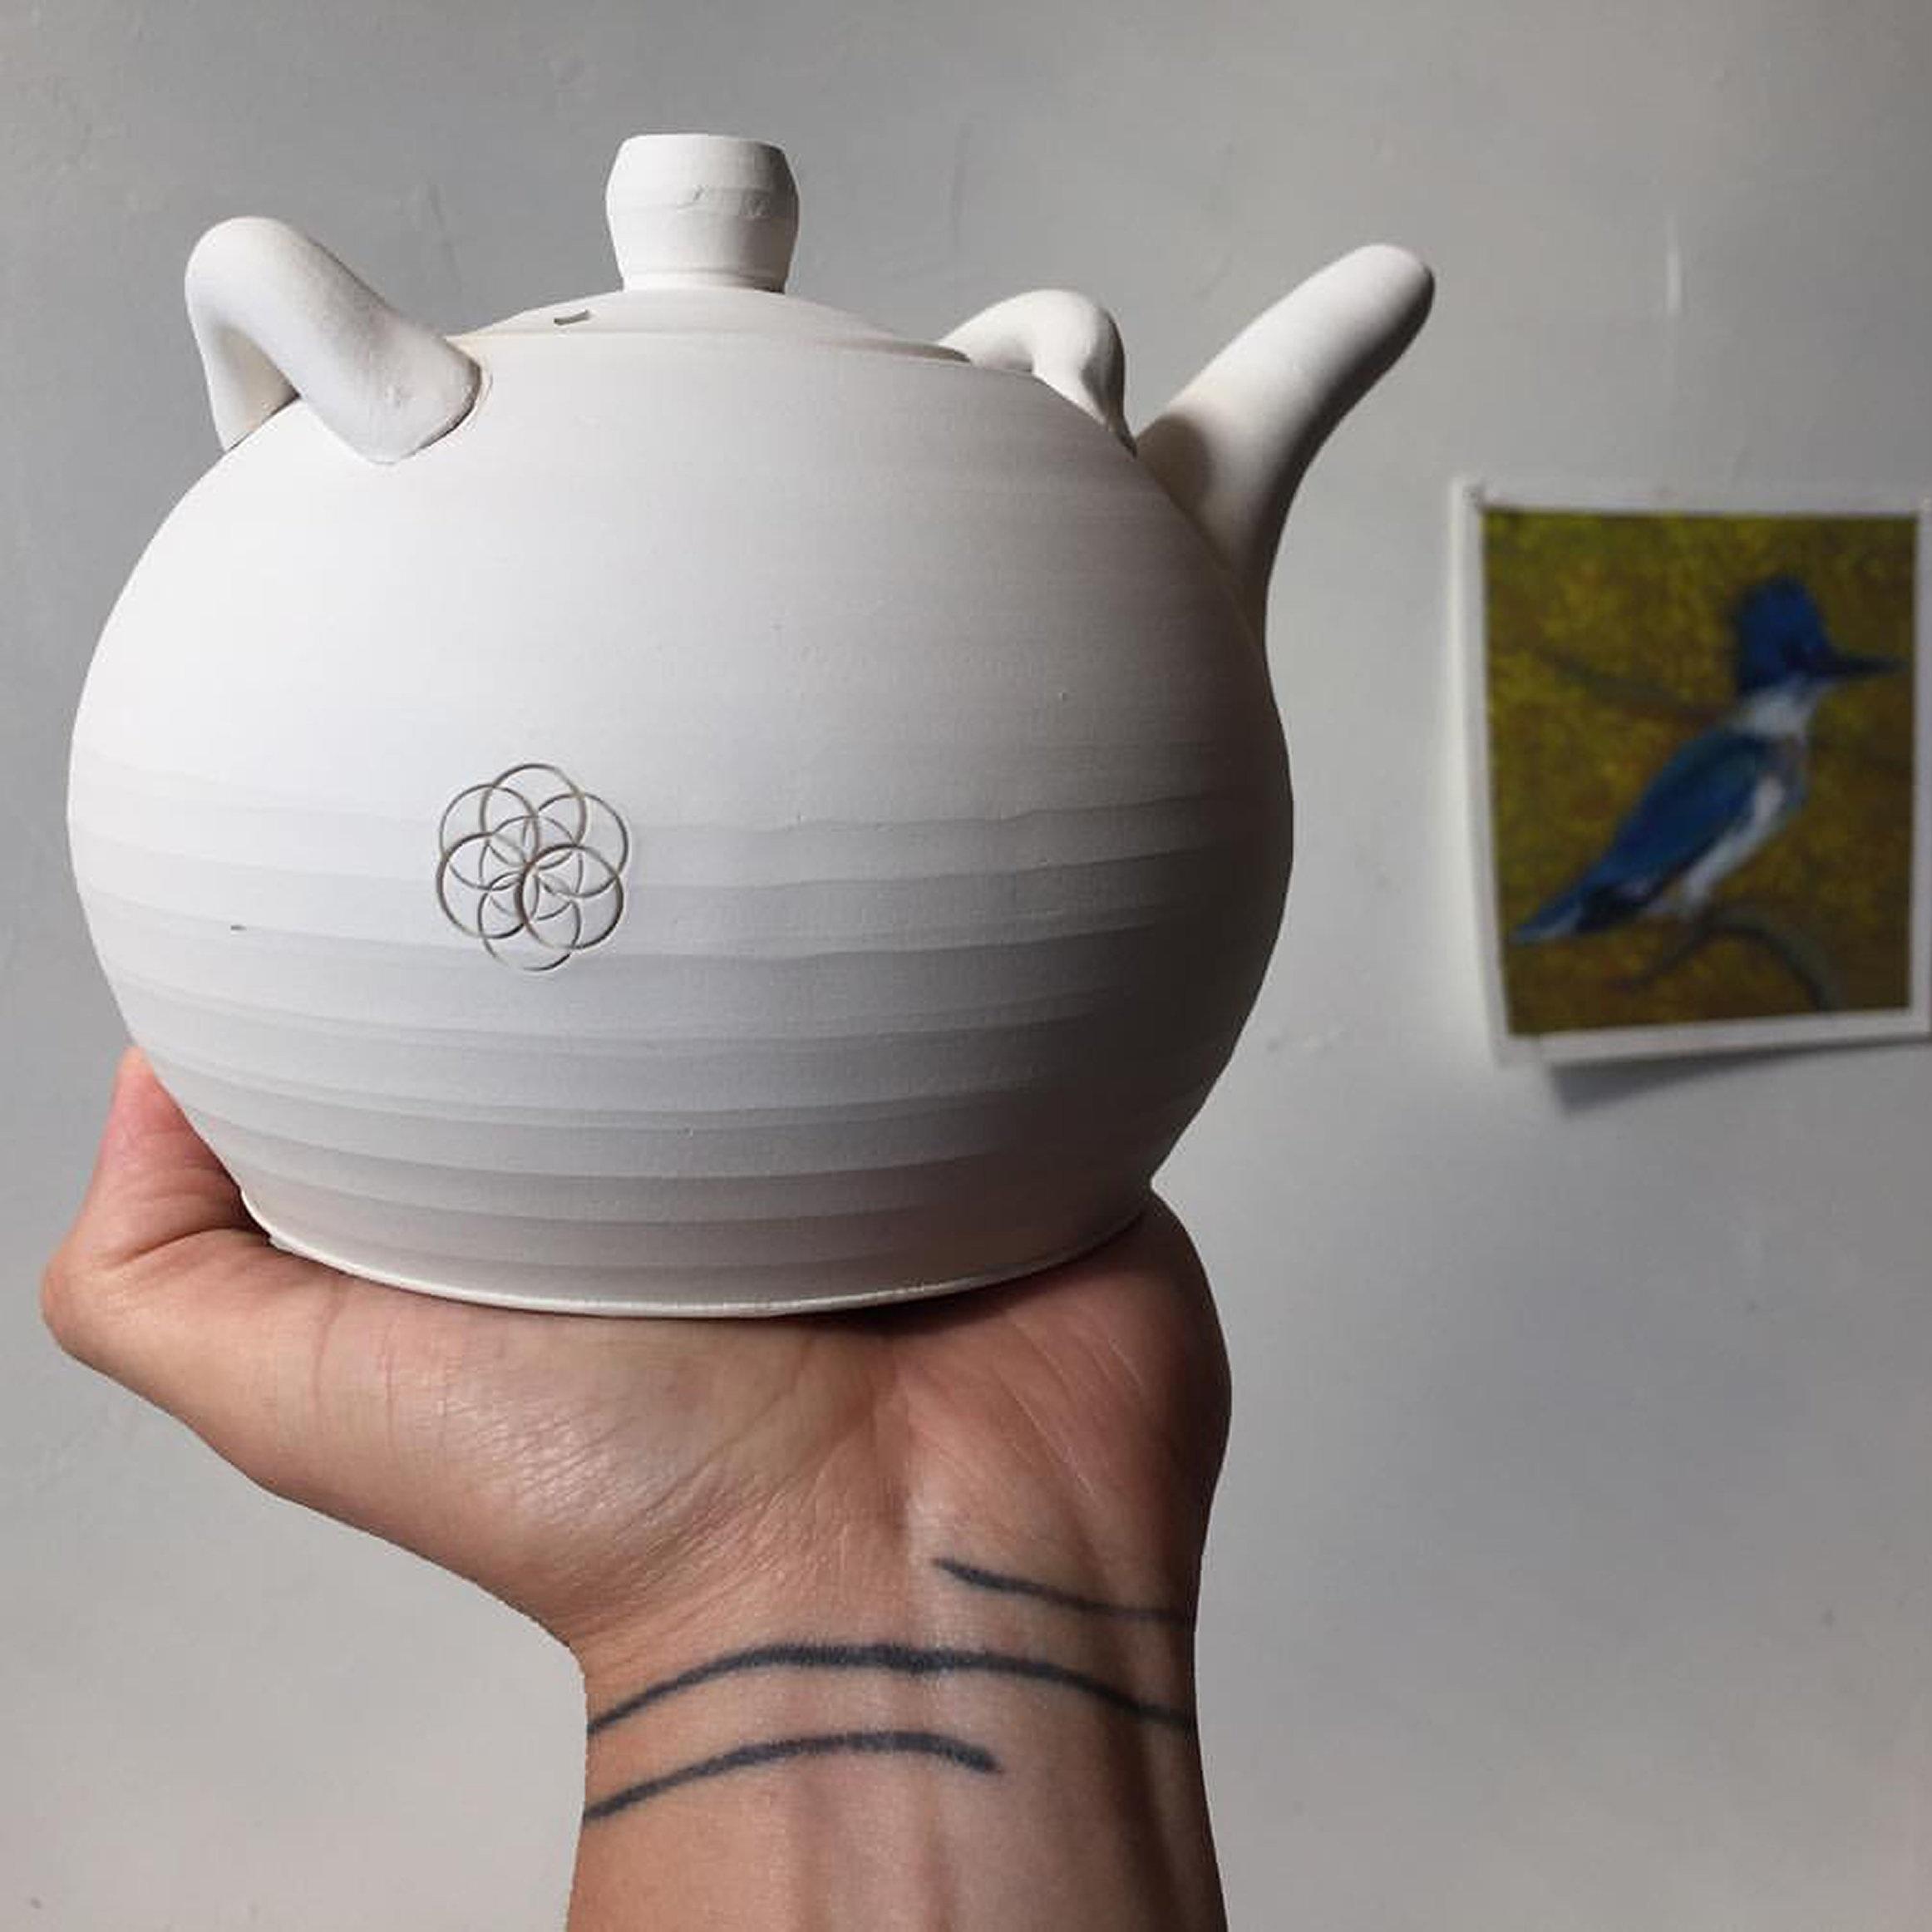 angus+hand+holding+pot.jpg